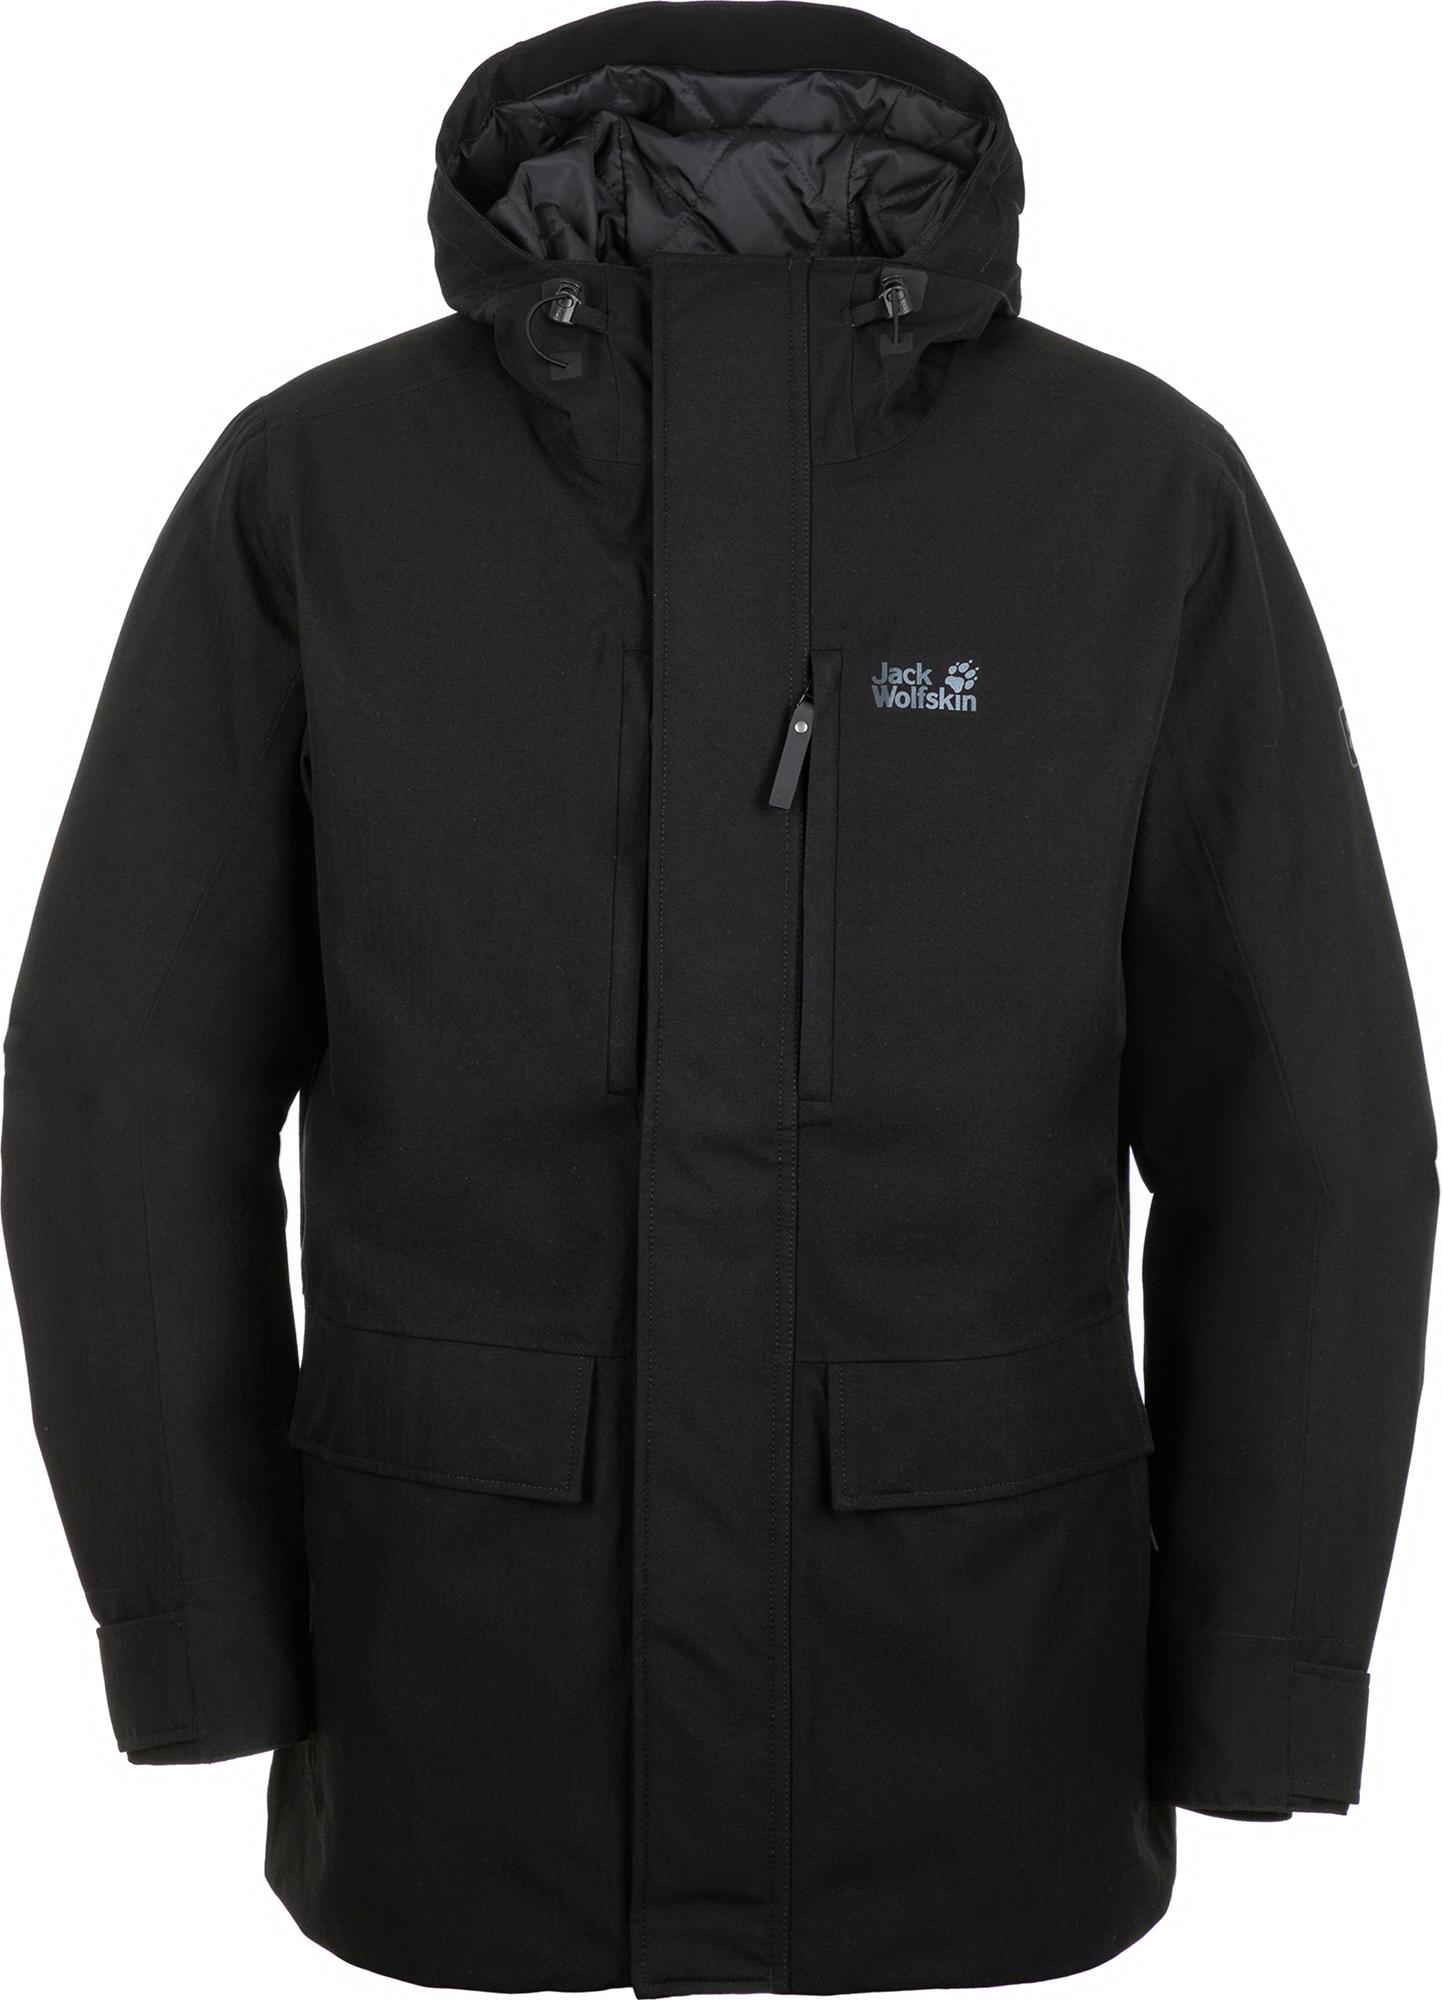 Jack Wolfskin Куртка утепленная мужская Jack Wolfskin West Coast, размер 58